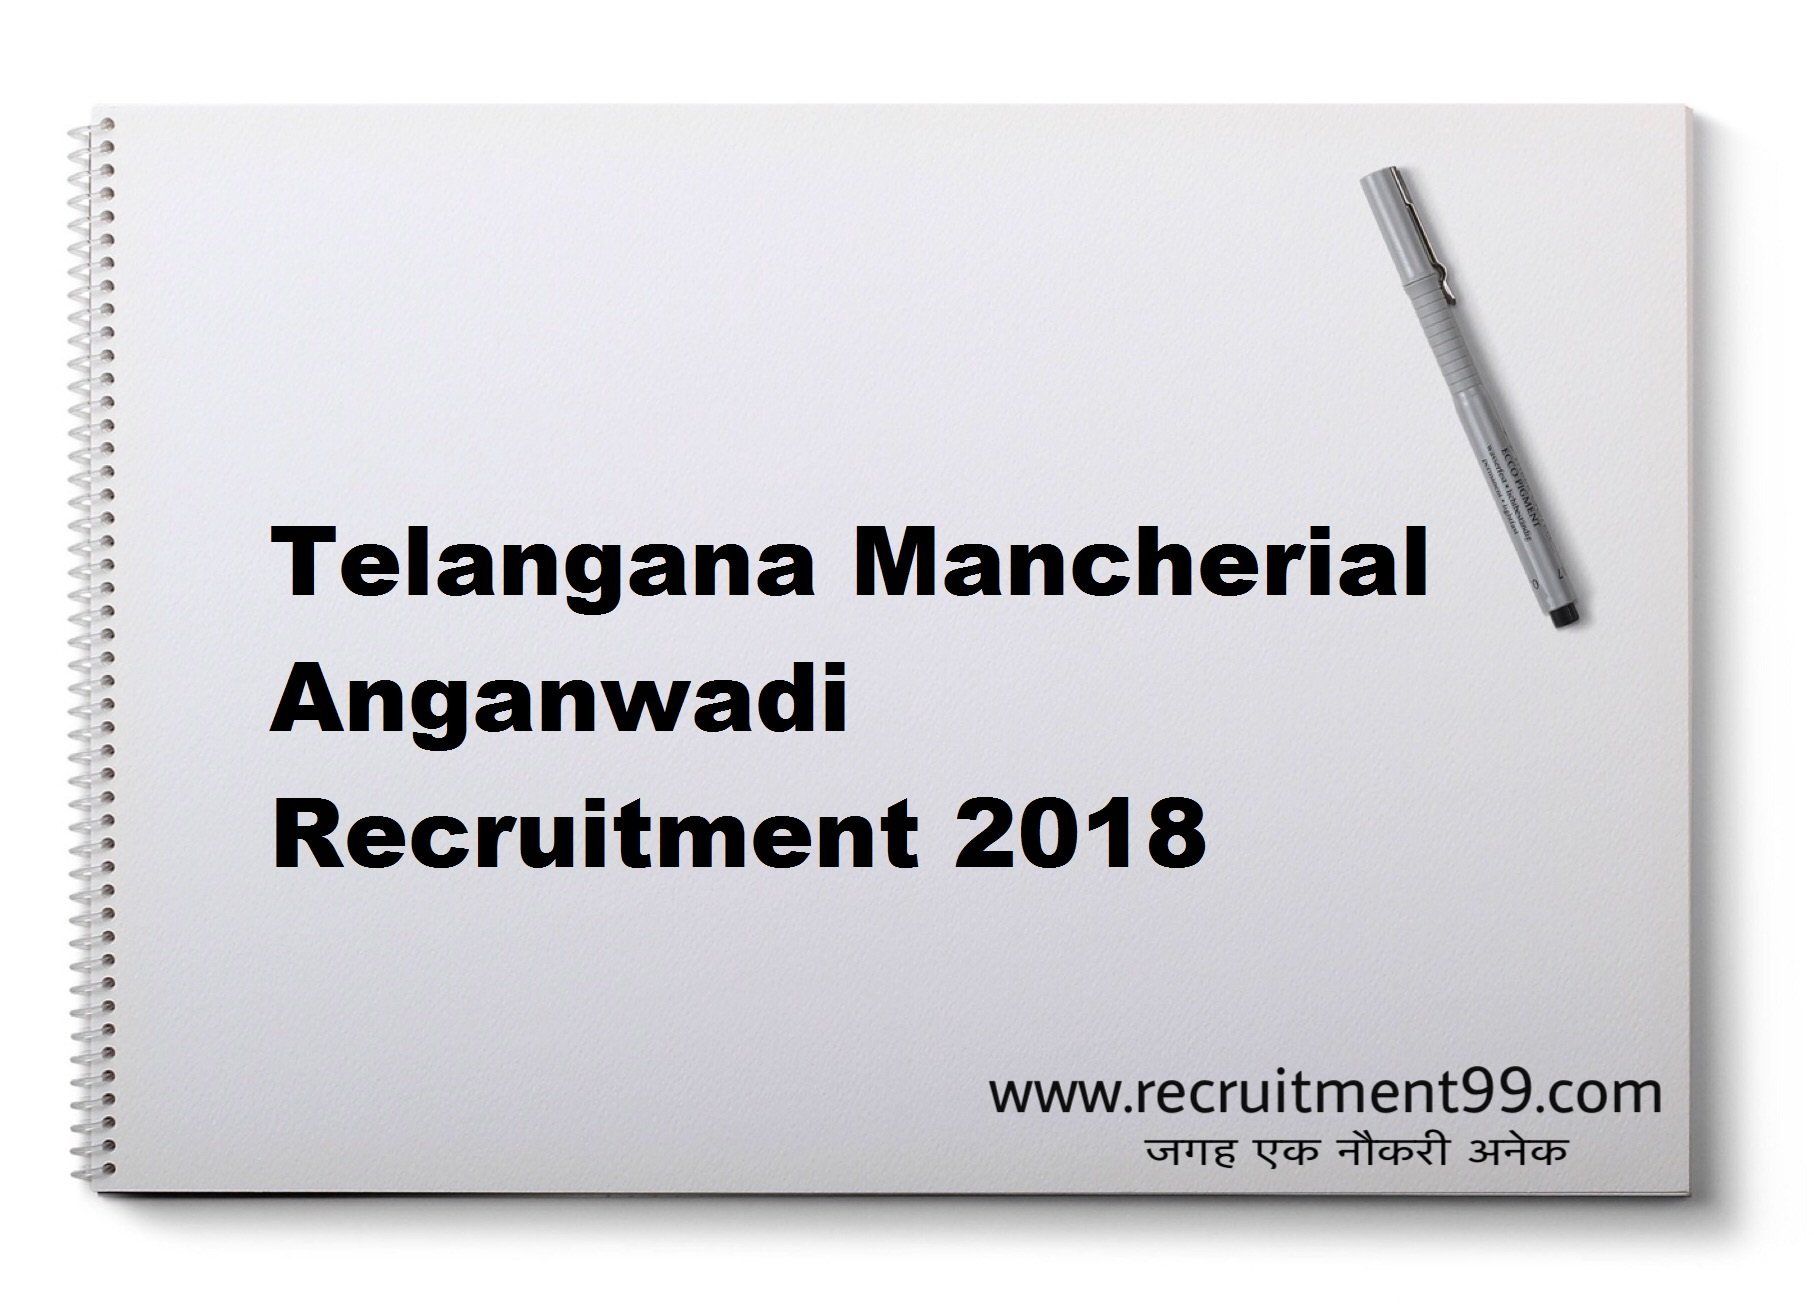 WCD Telangana AWS AWT AWH mini AWS Recruitment Admit Card Result 2018